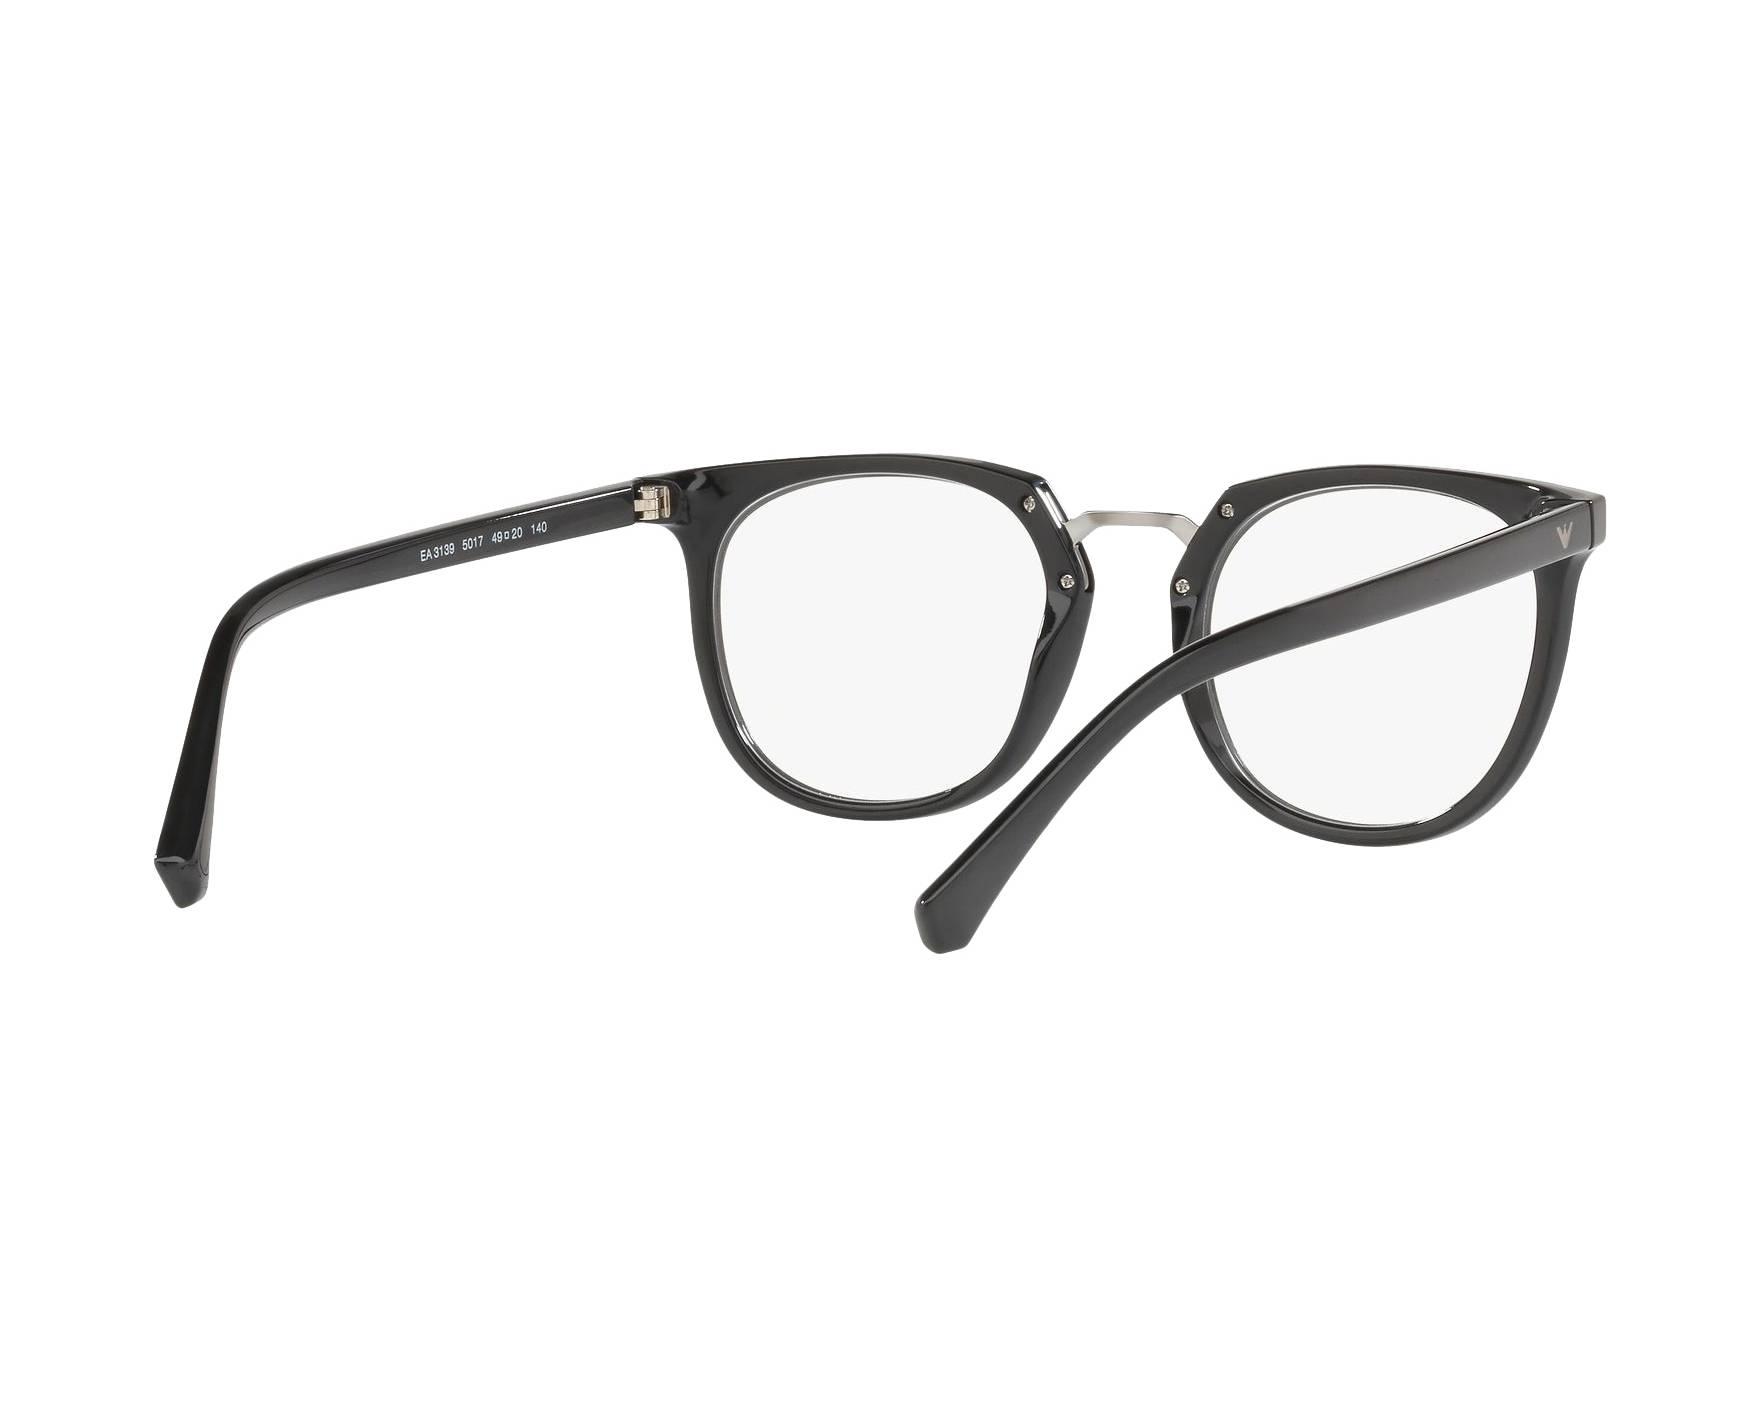 909e5c465ff eyeglasses Emporio Armani EA-3139 5017 51-20 Black 360 degree view 8